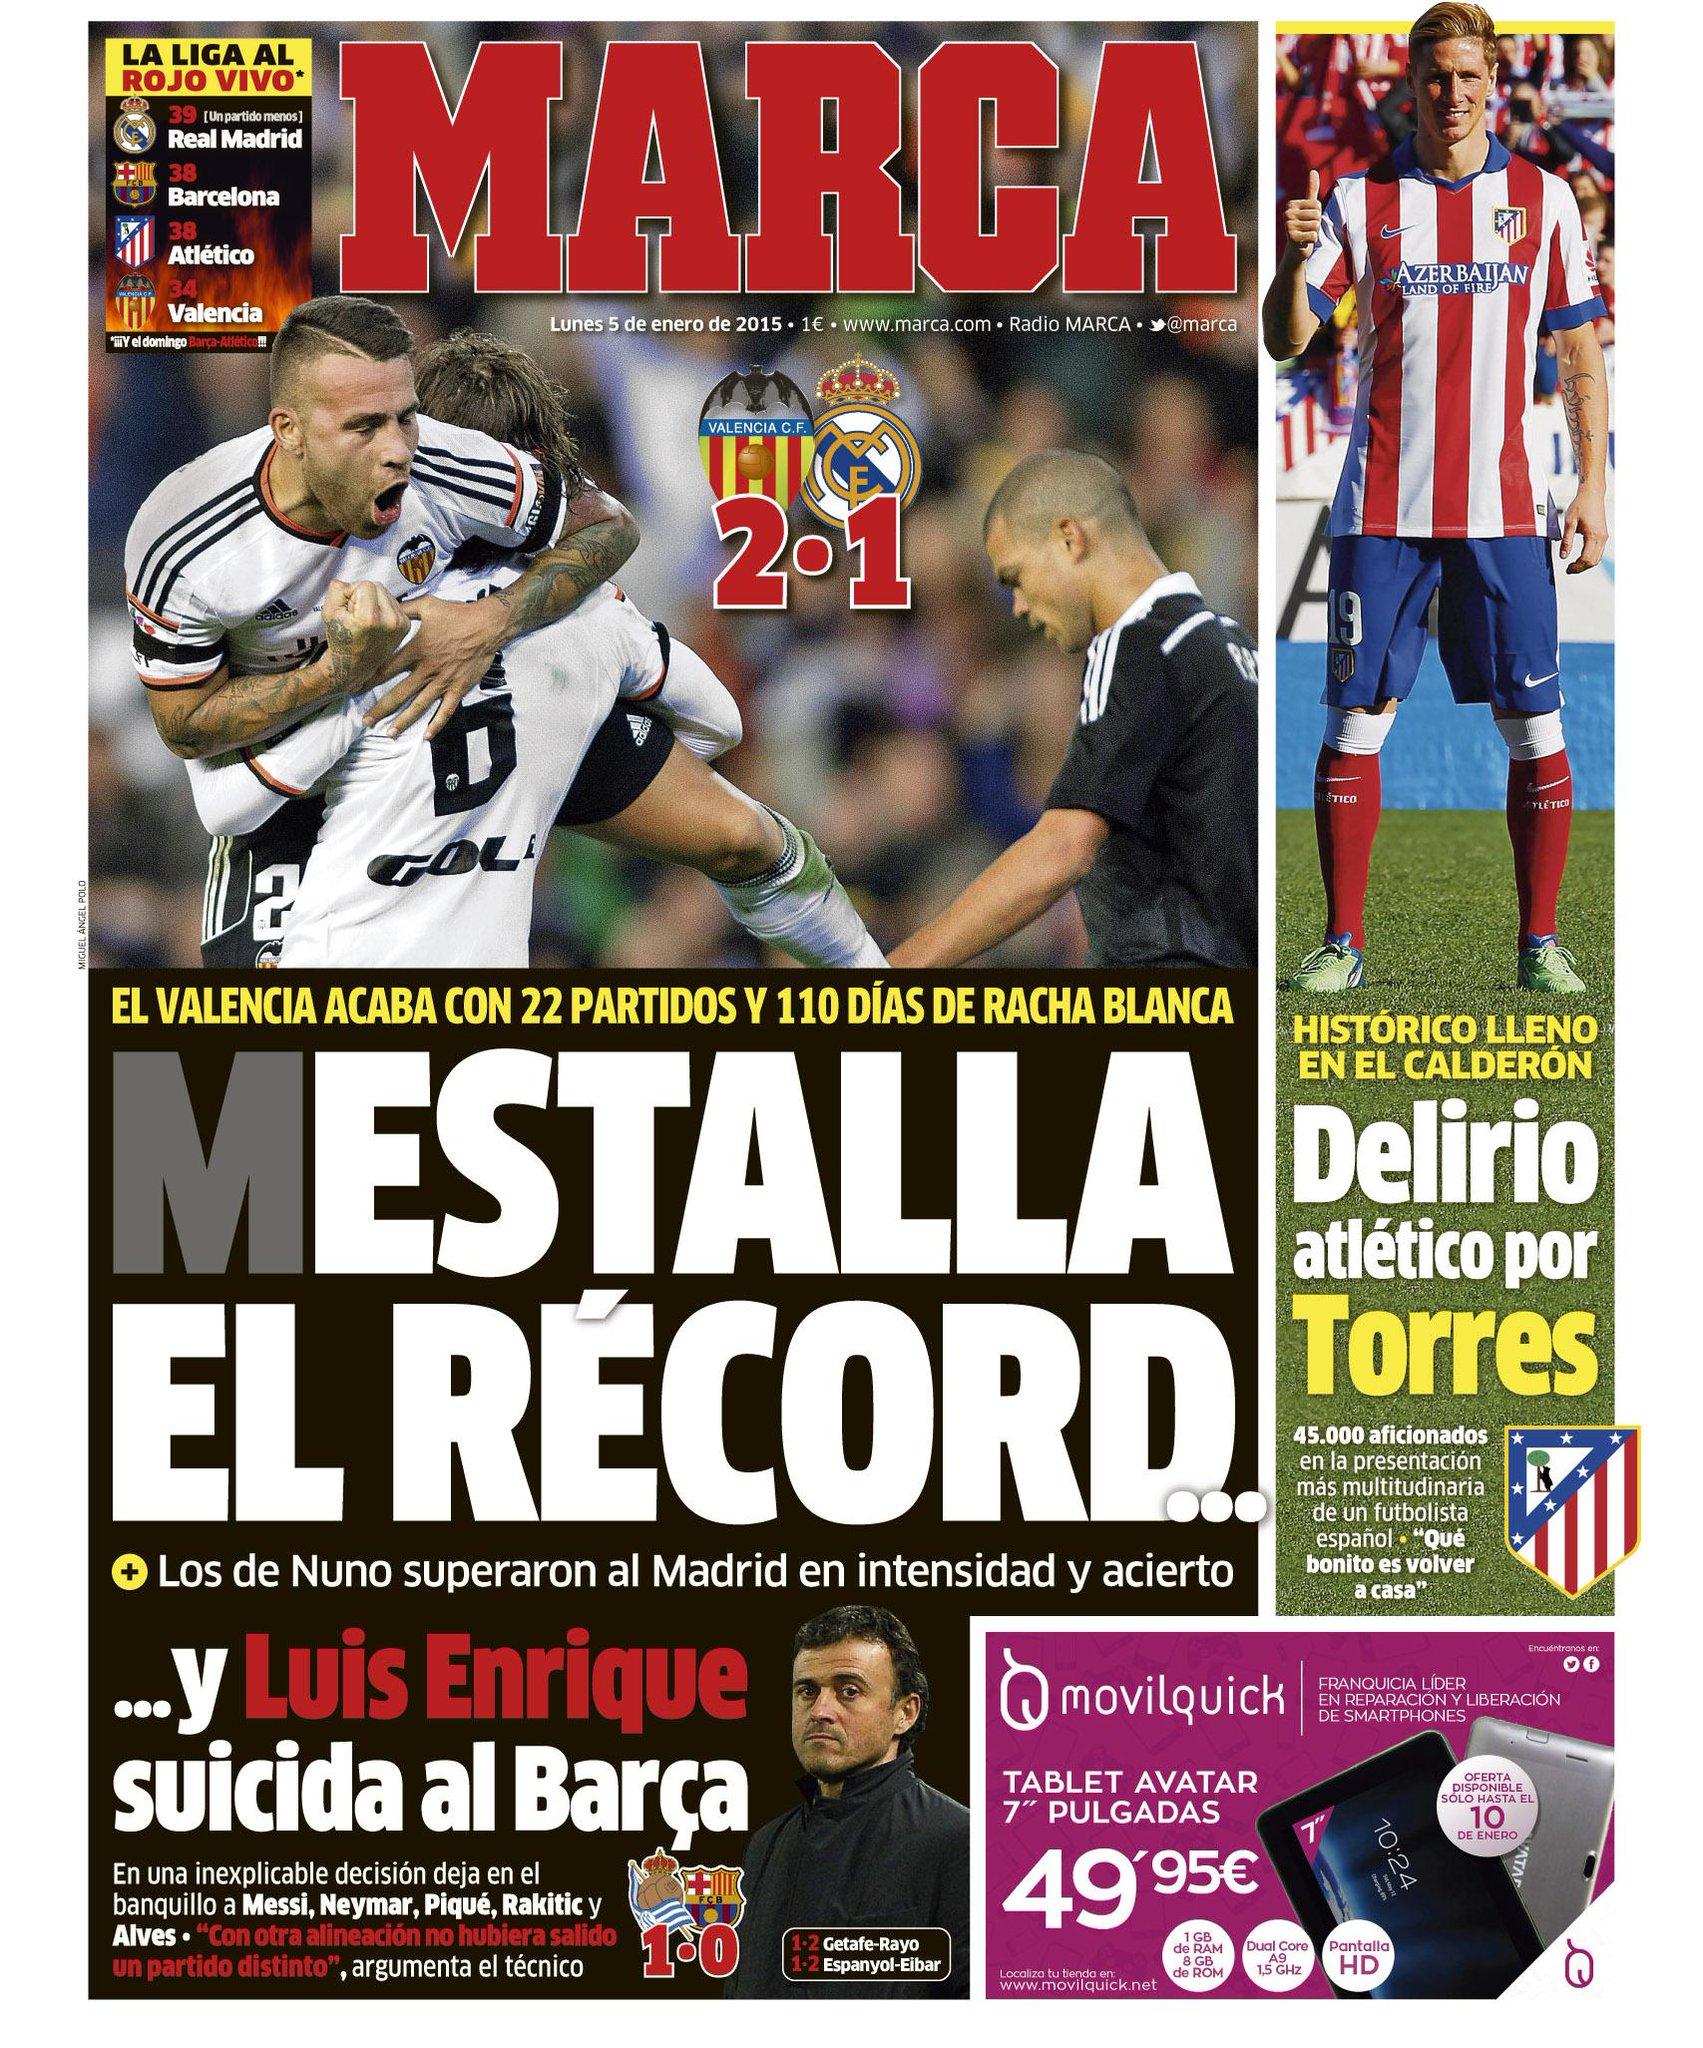 Mestalla el récord #LaPortada http://t.co/jn6sSw56eF